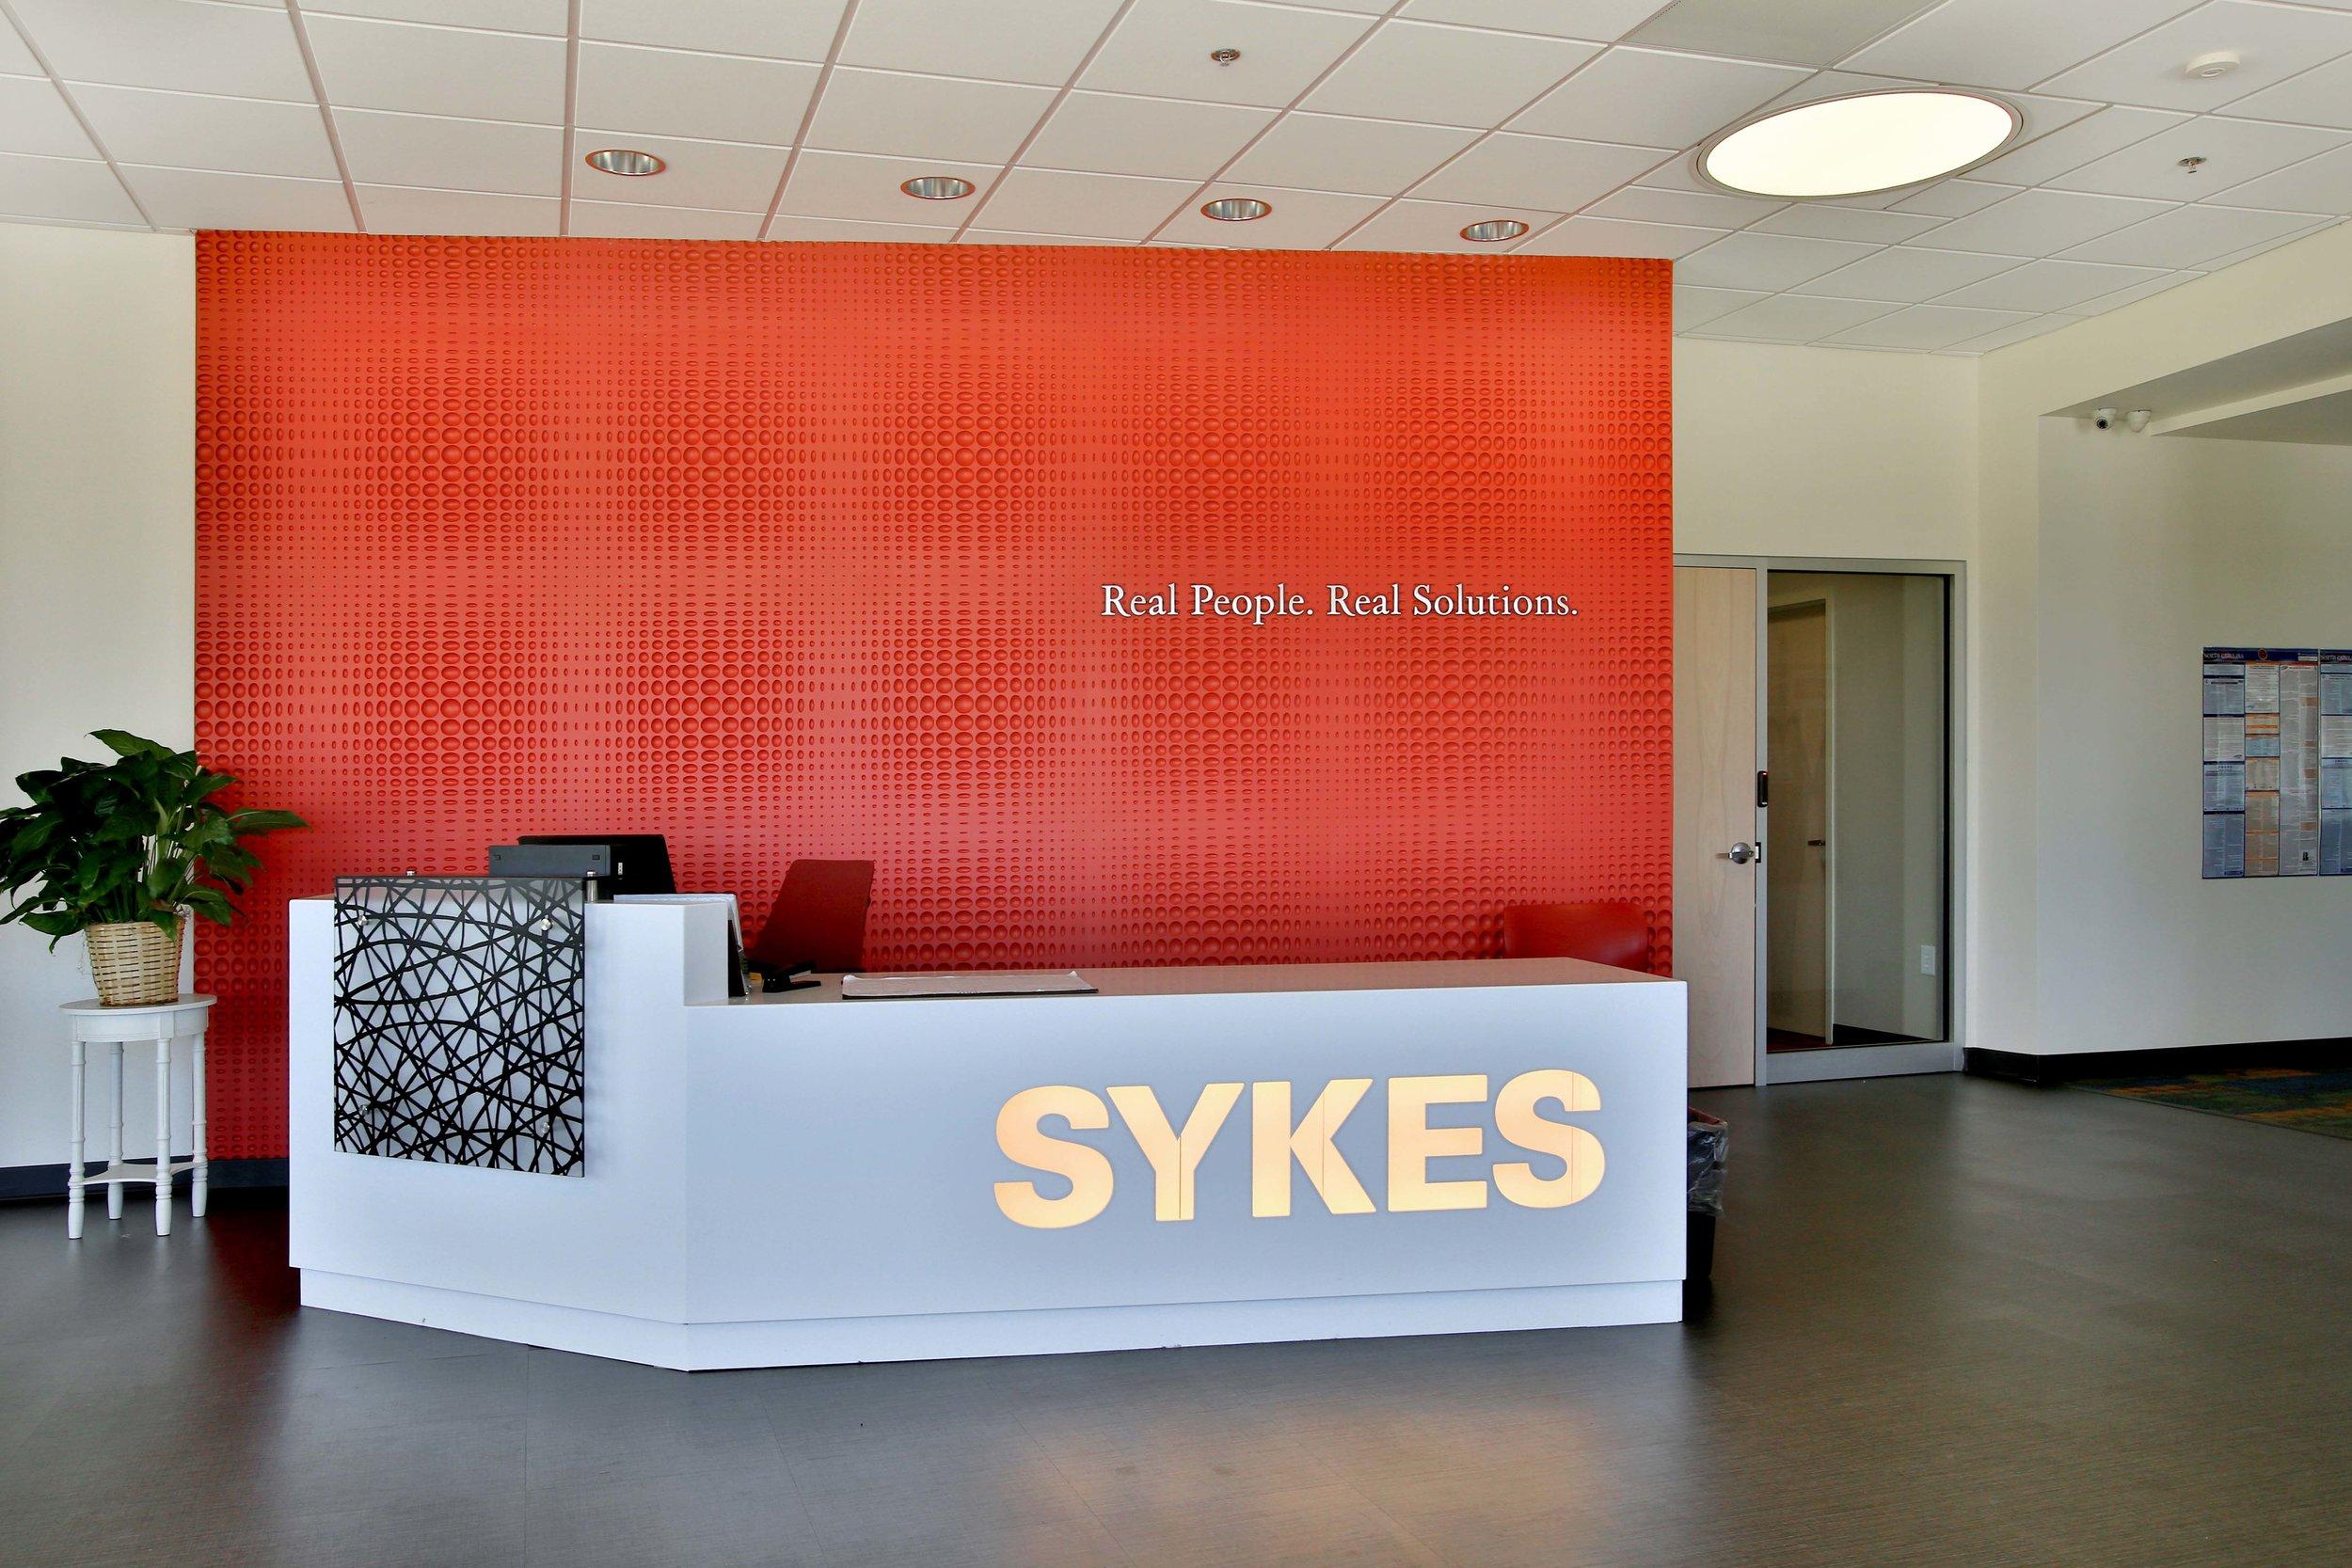 14-0417-114-Sykes.jpg